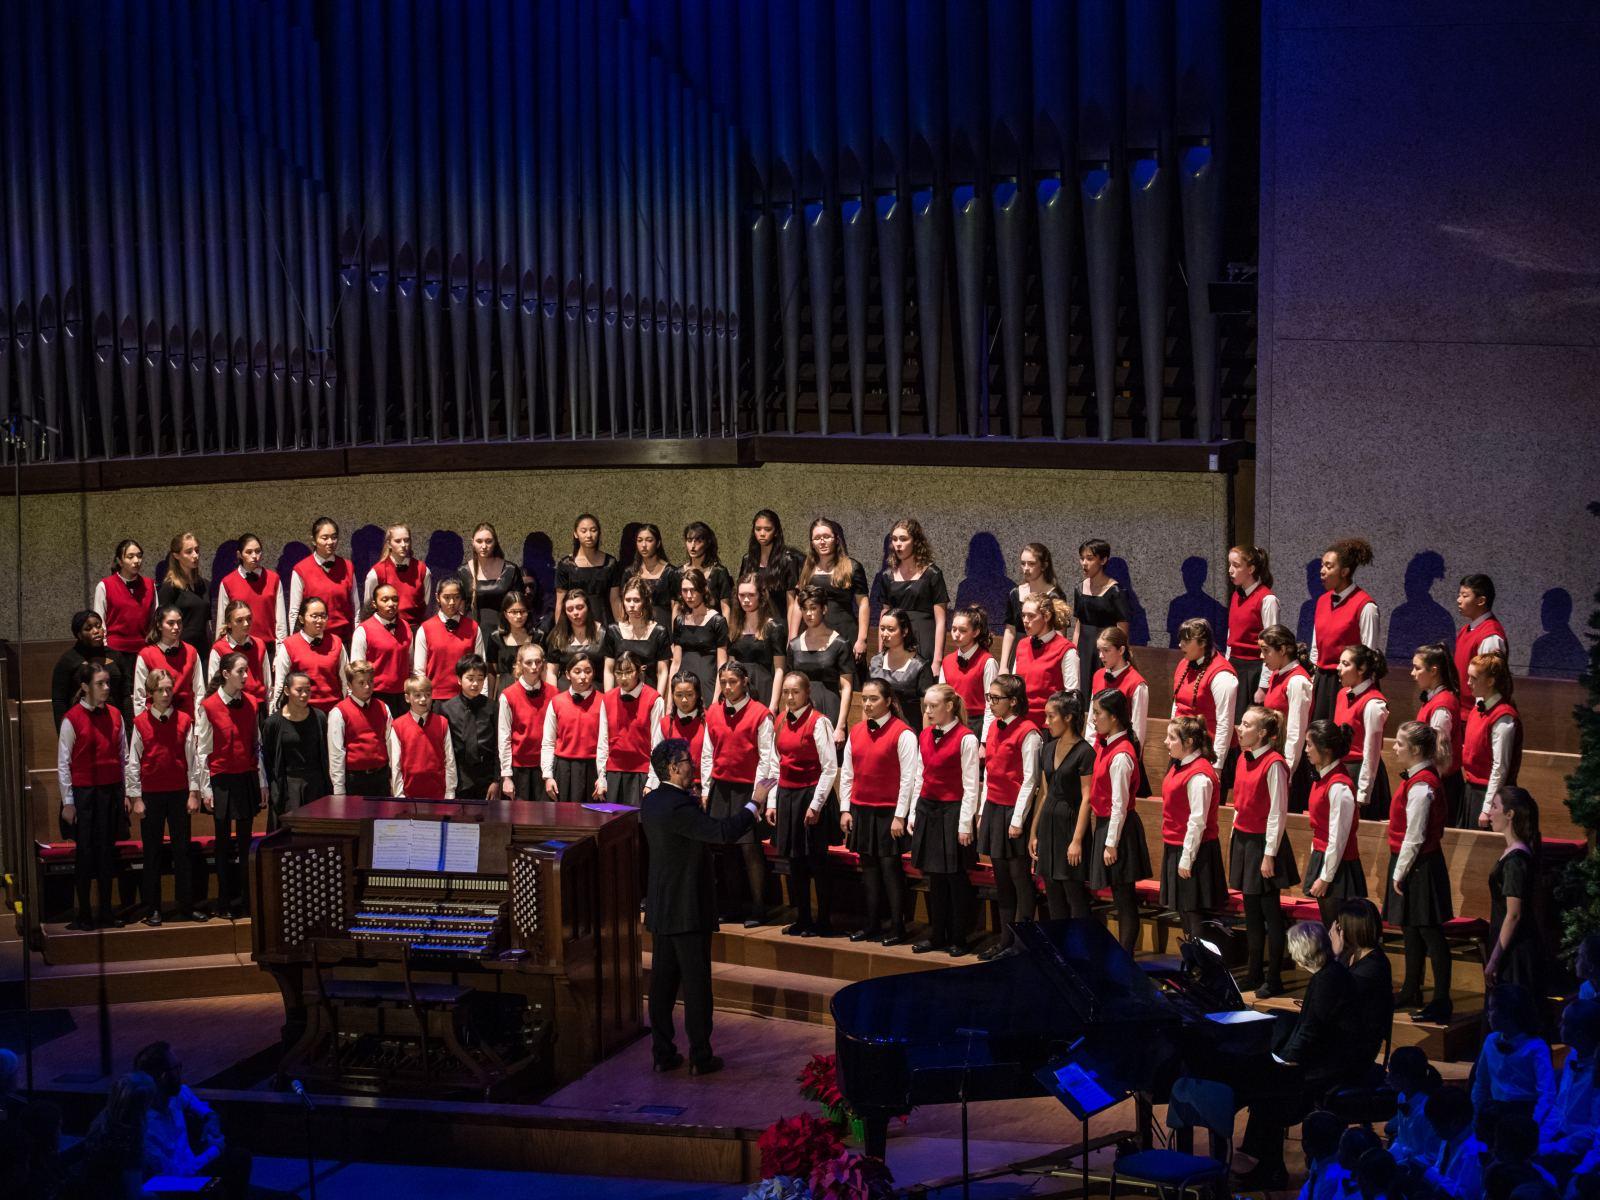 Los Angeles Children's Chorus  photographed by Jamie Pham